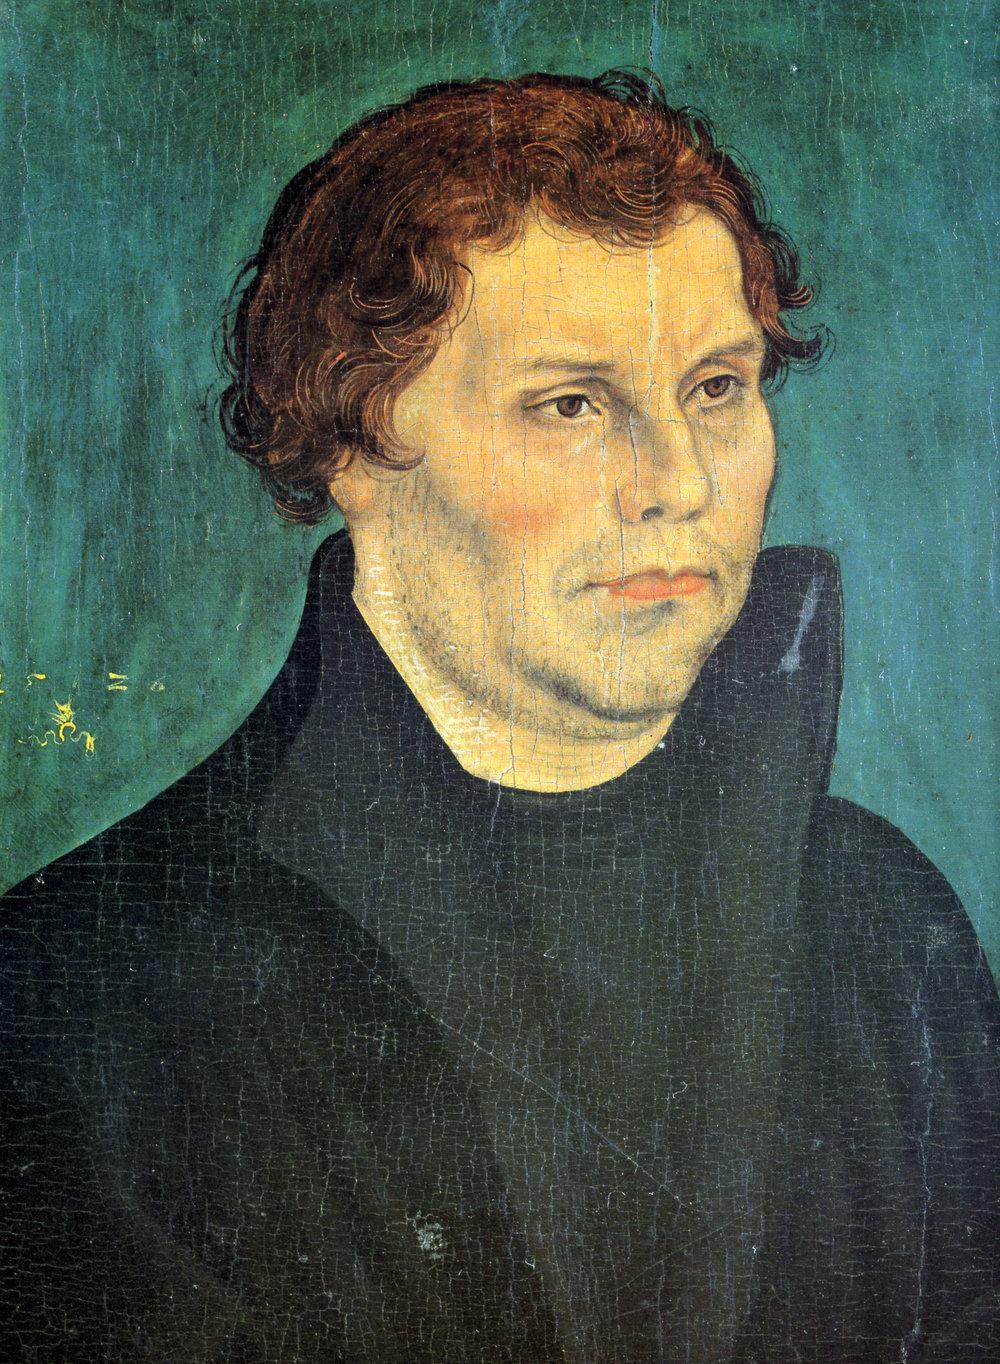 Martin Luther , painting by Lucas Cranach the Elder, Wartburg (1526)